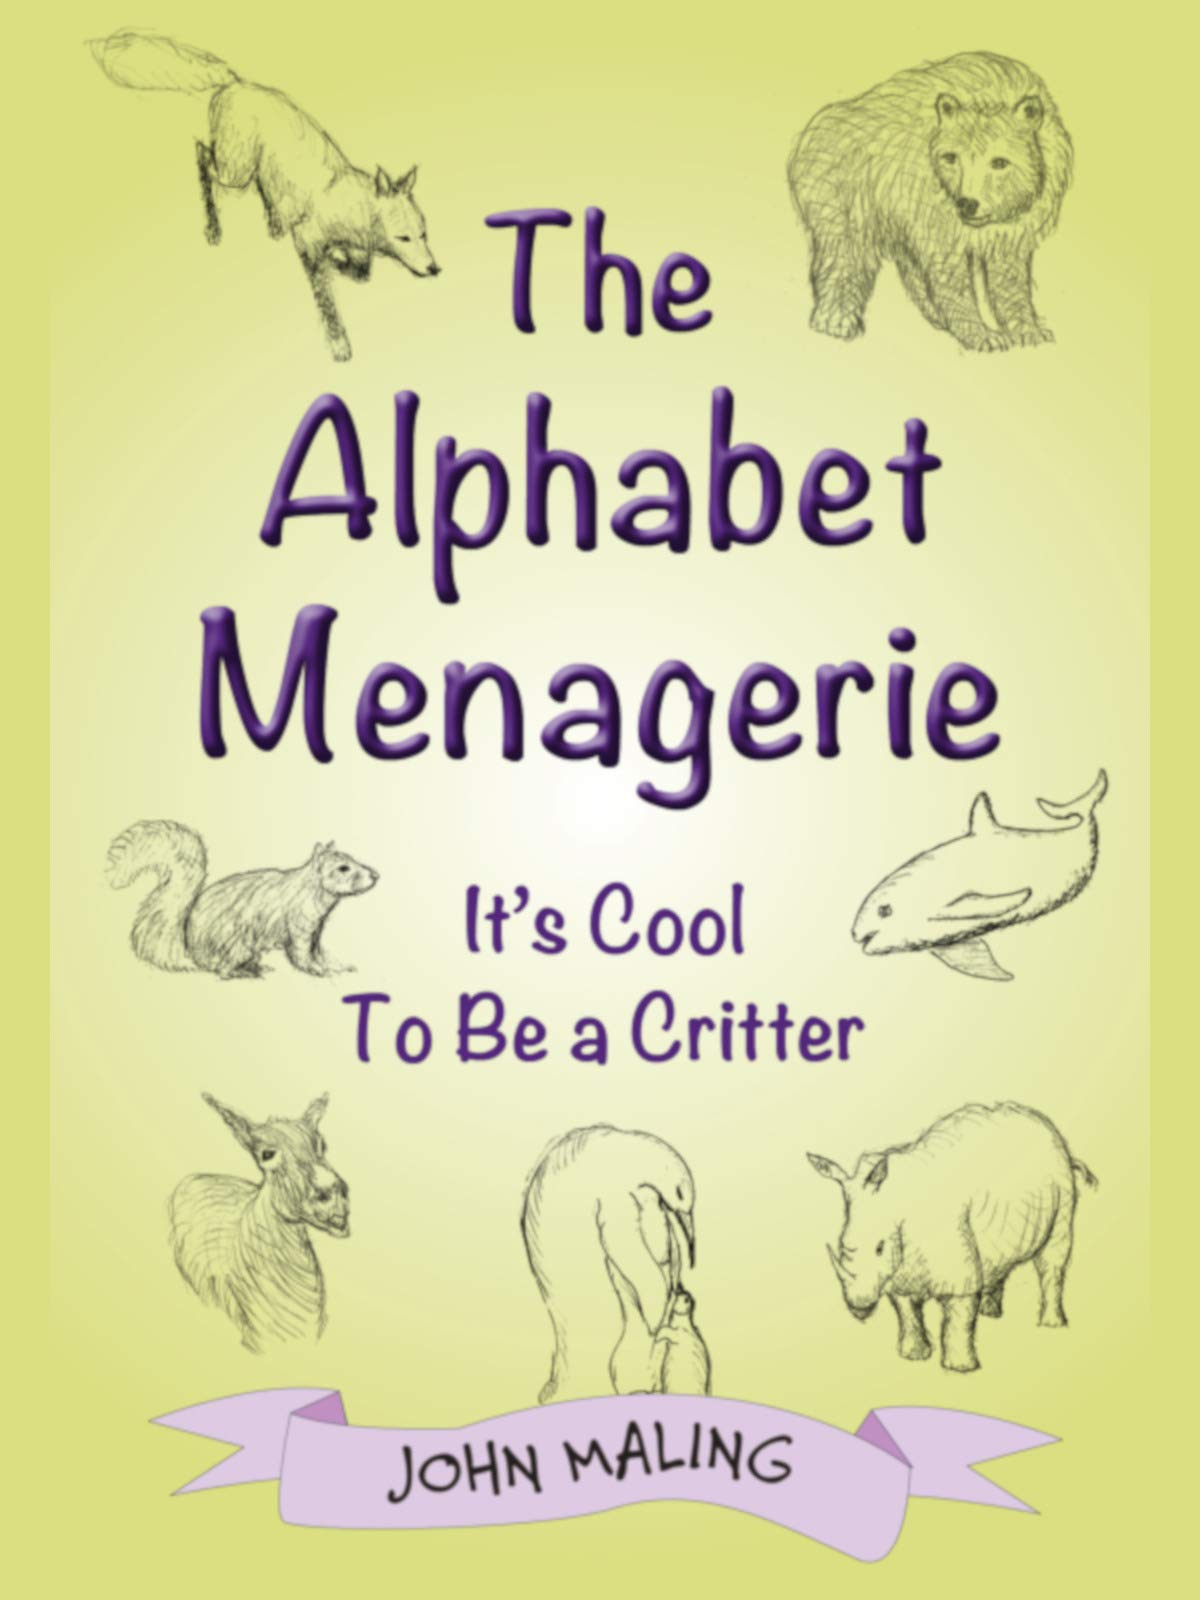 The Alphabet Menagerie